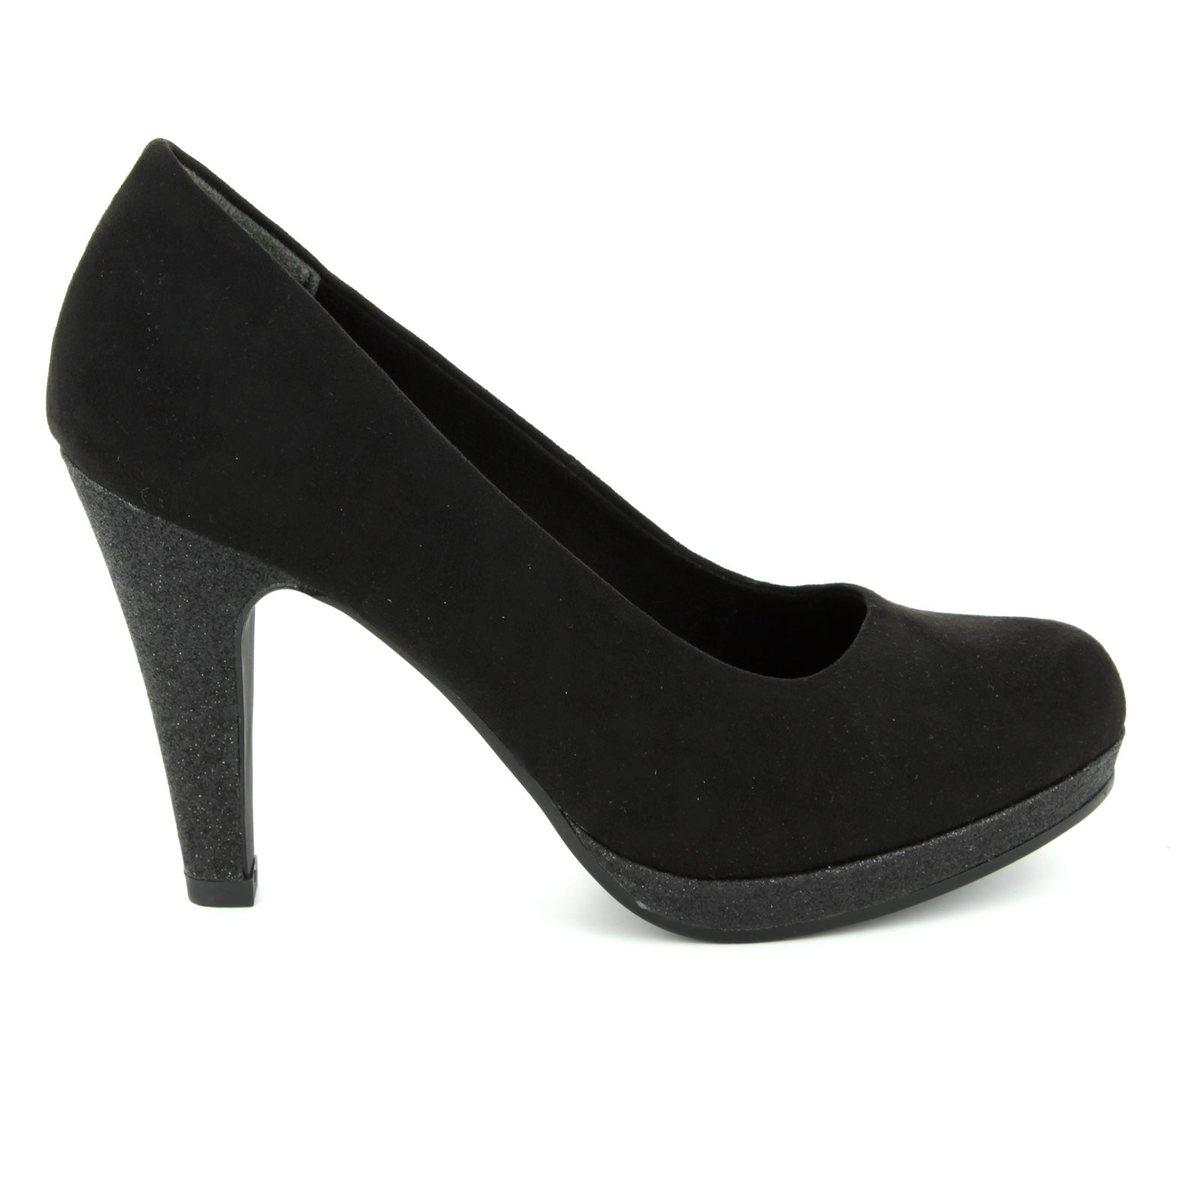 Womens 22441 Closed Toe Heels, Black, 3 UK Marco Tozzi